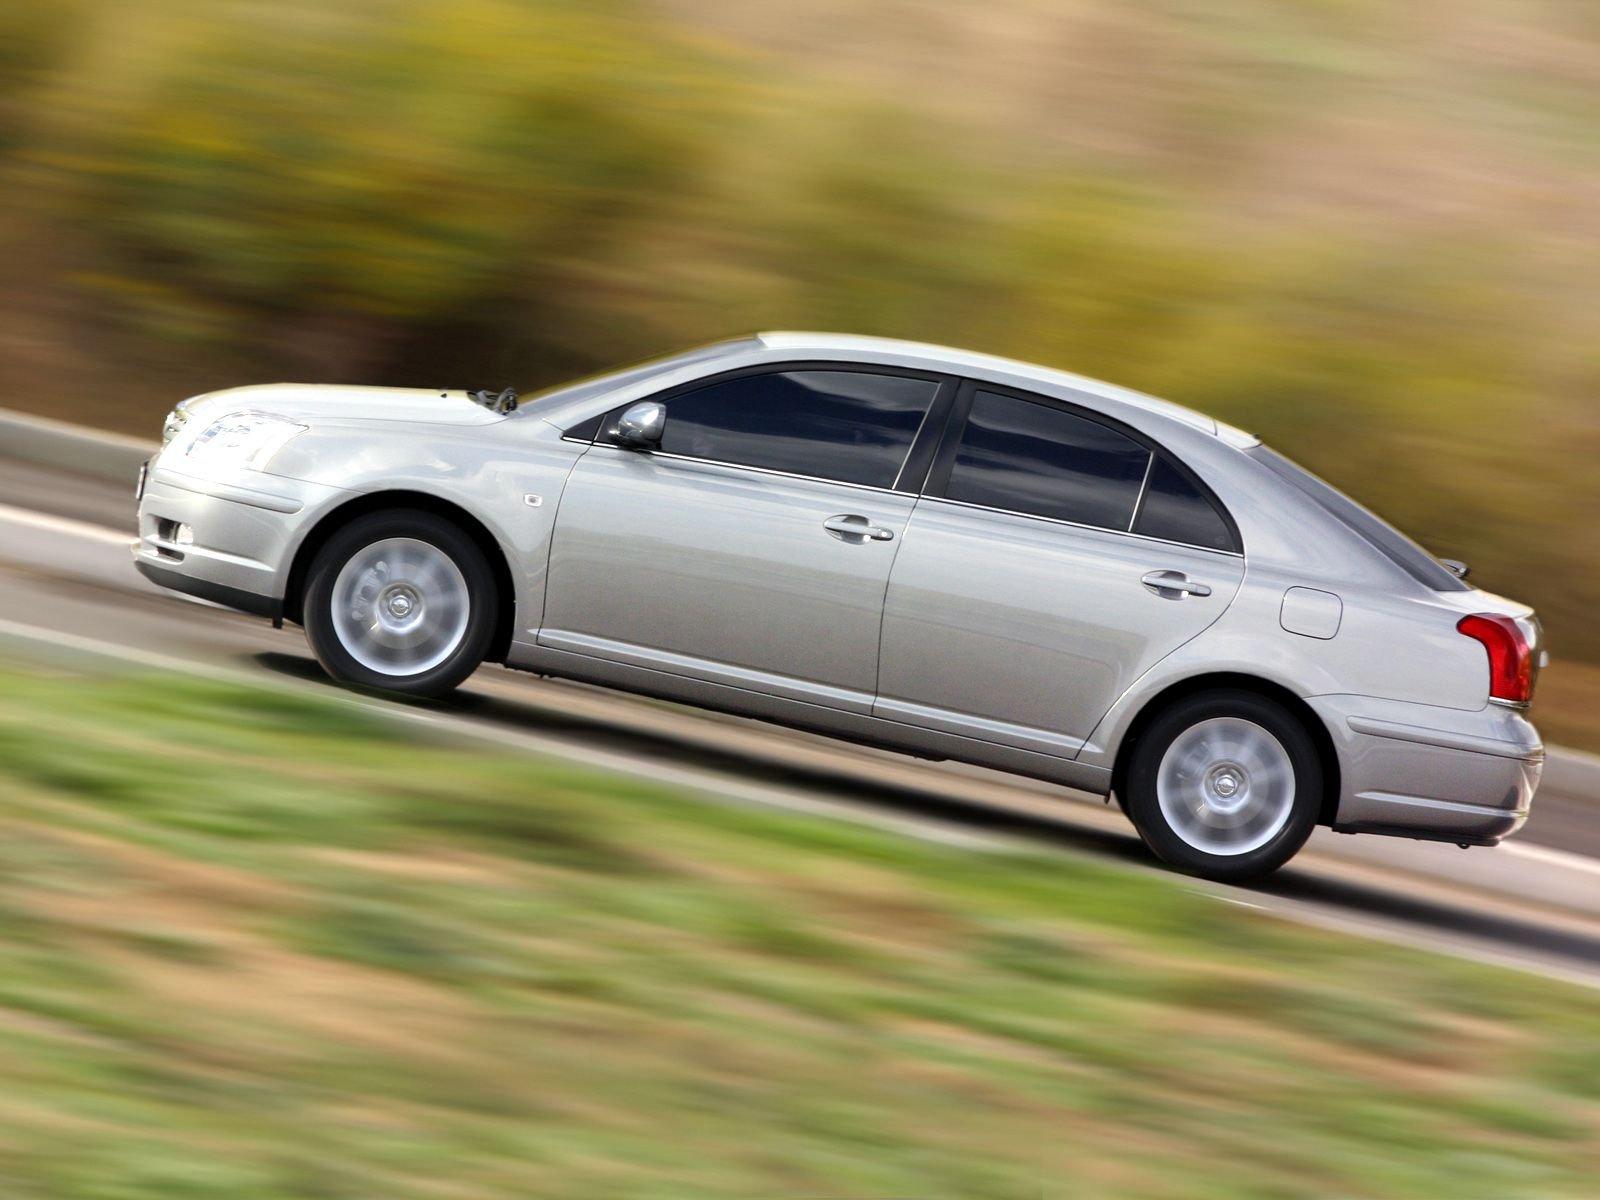 Тойота авенсис 2003 2005 хэтчбек 5 дв